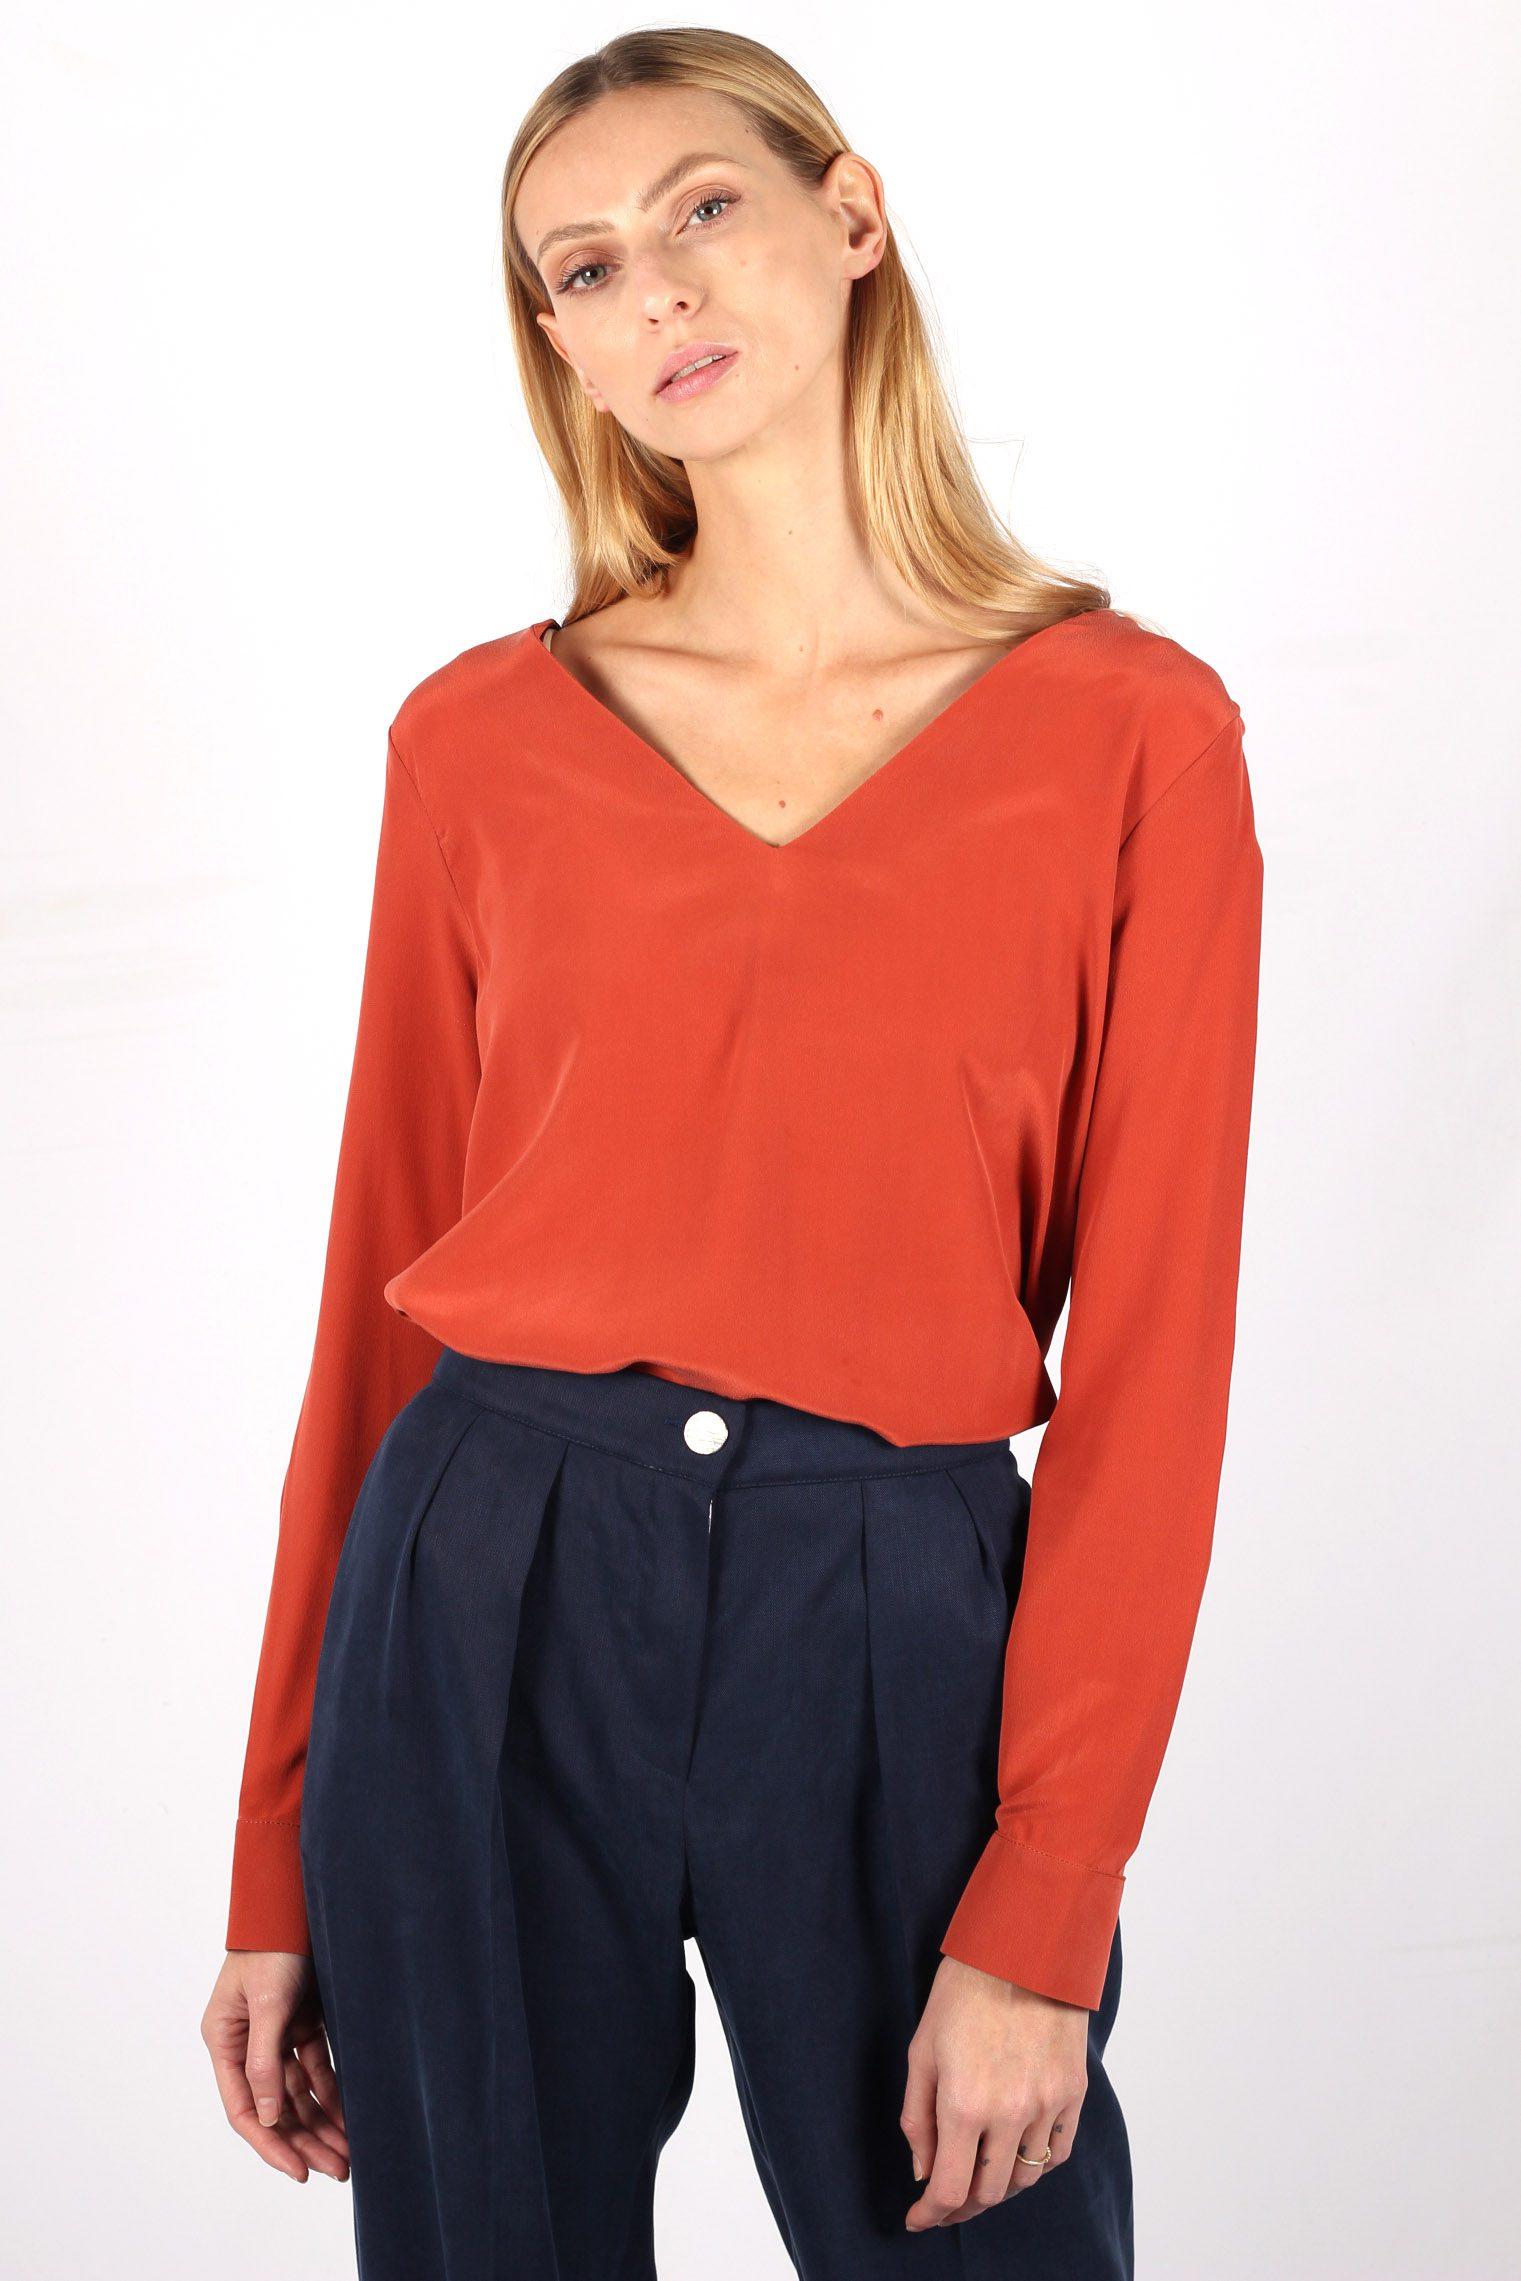 blouse soie terracotta 5